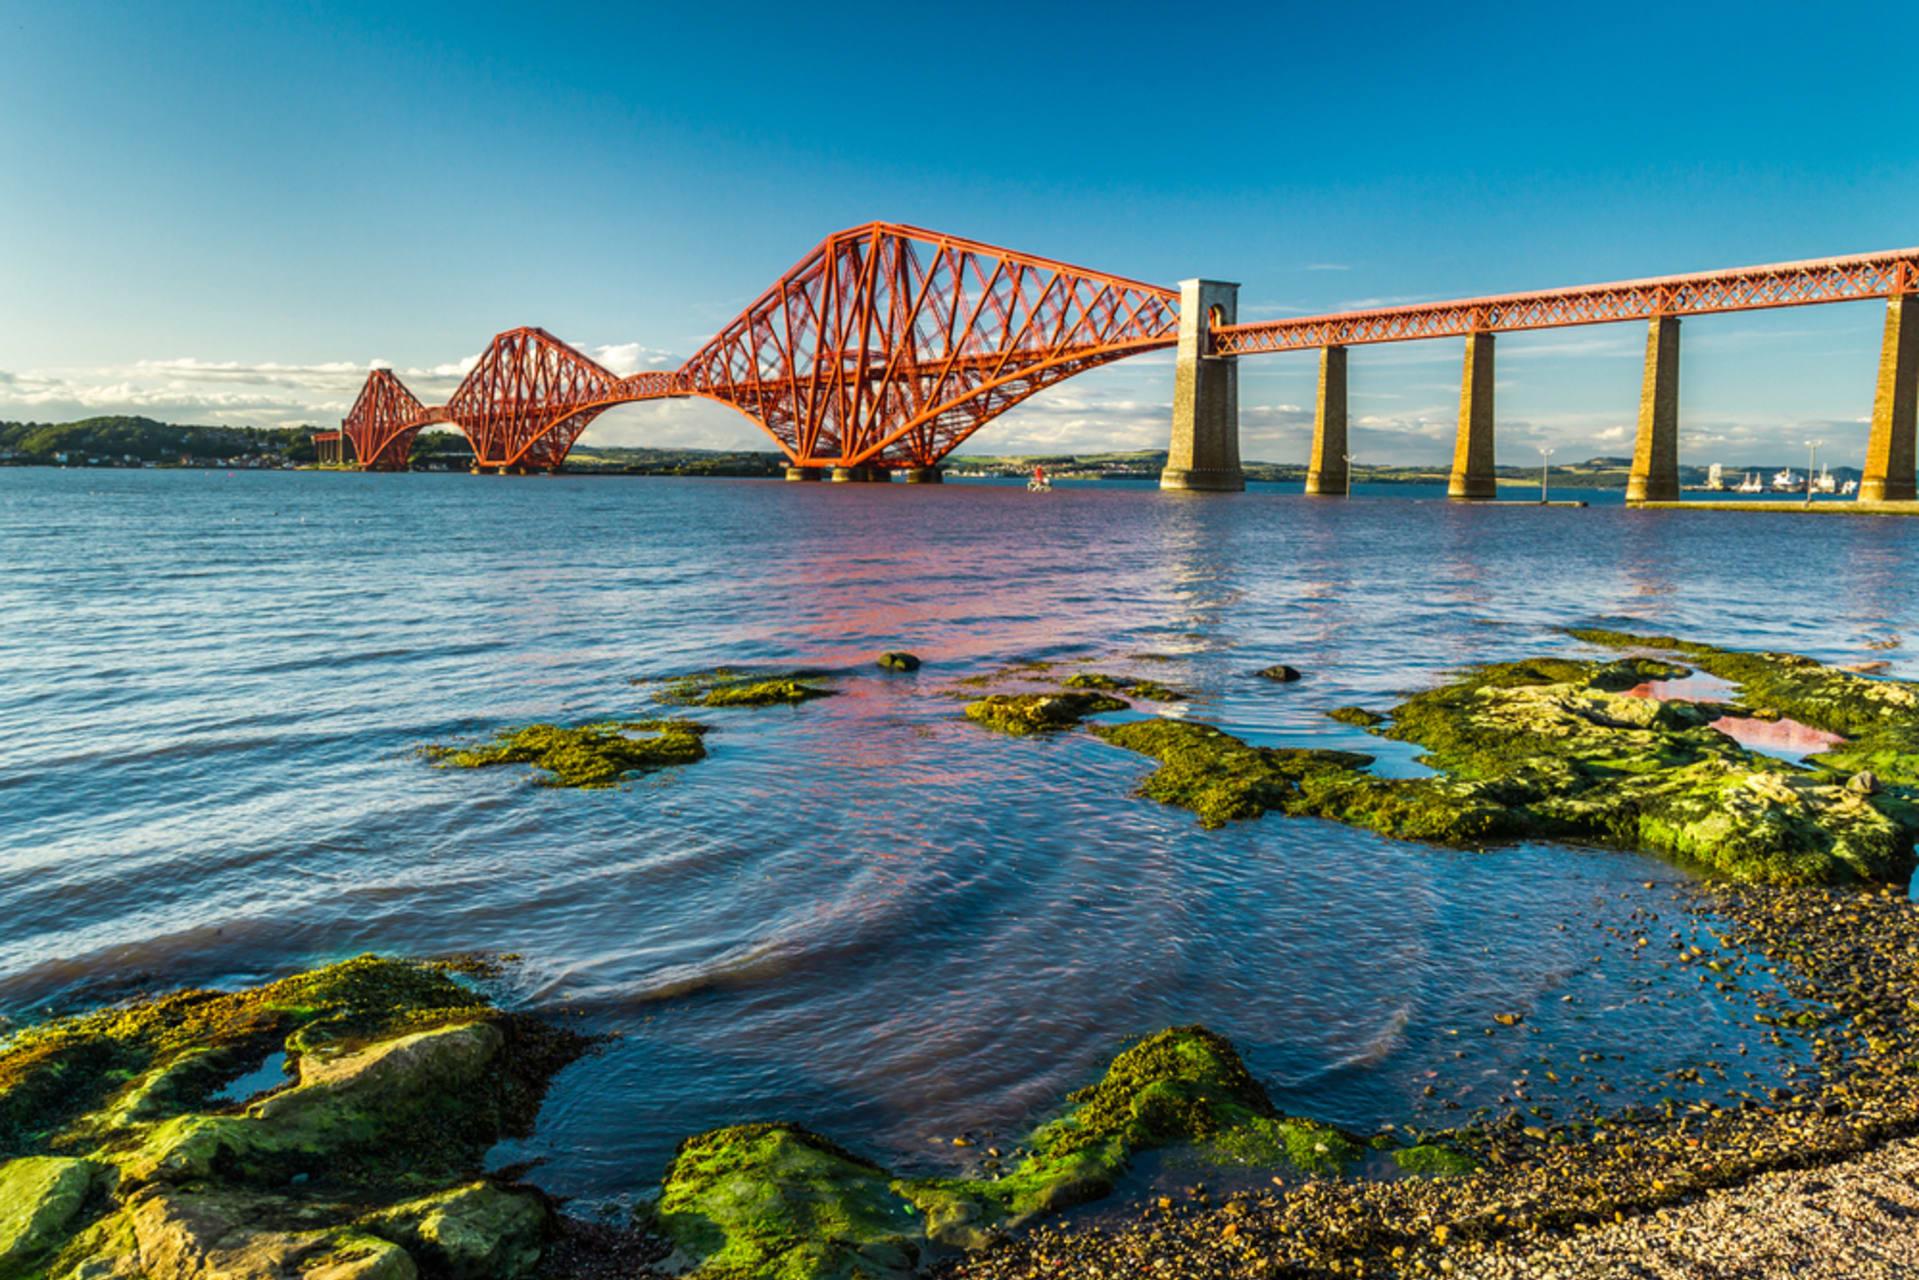 Central Scotland - A stroll across the Forth Bridge